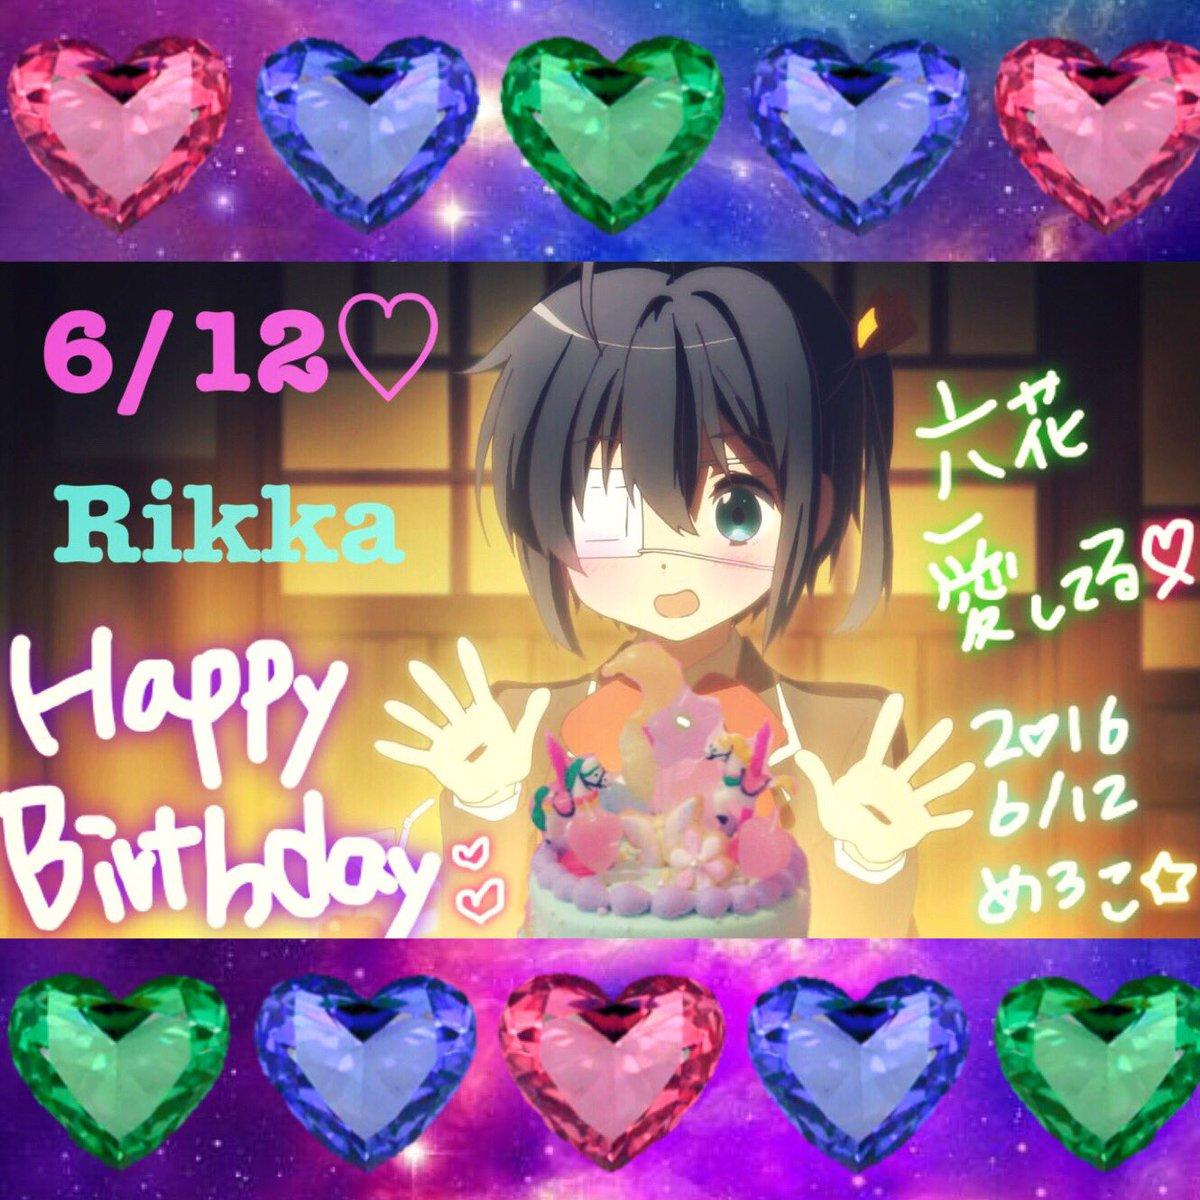 Rikka happy birthday🎂💓💓邪王真眼は最強♡#小鳥遊六花生誕祭2016 #6月12日は小鳥遊六花の誕生